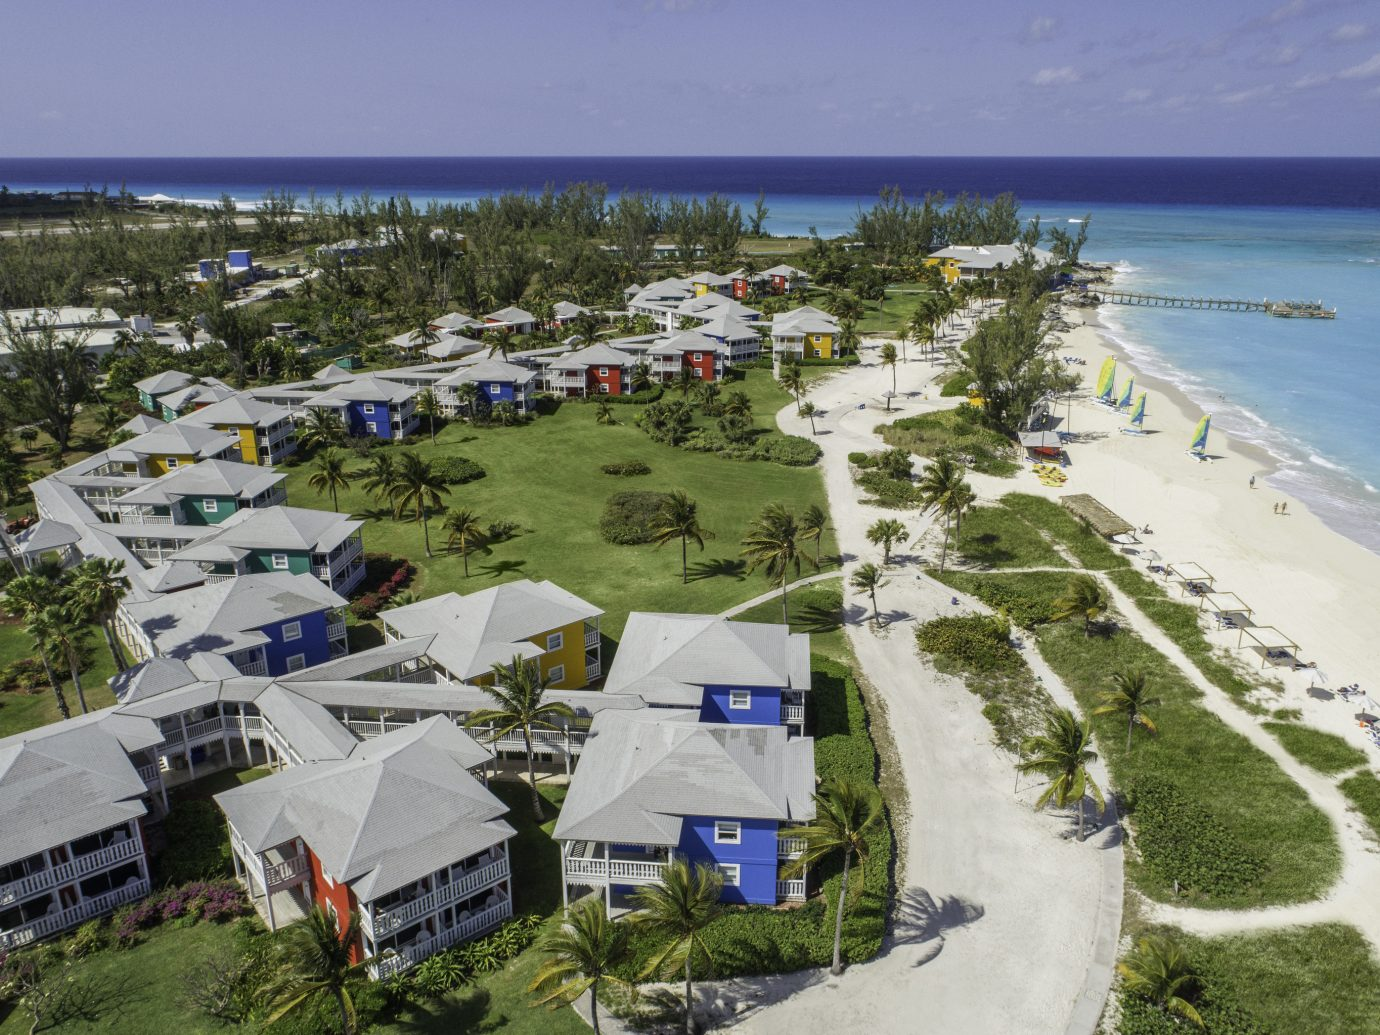 Aerial view of Club Med Columbus Isle